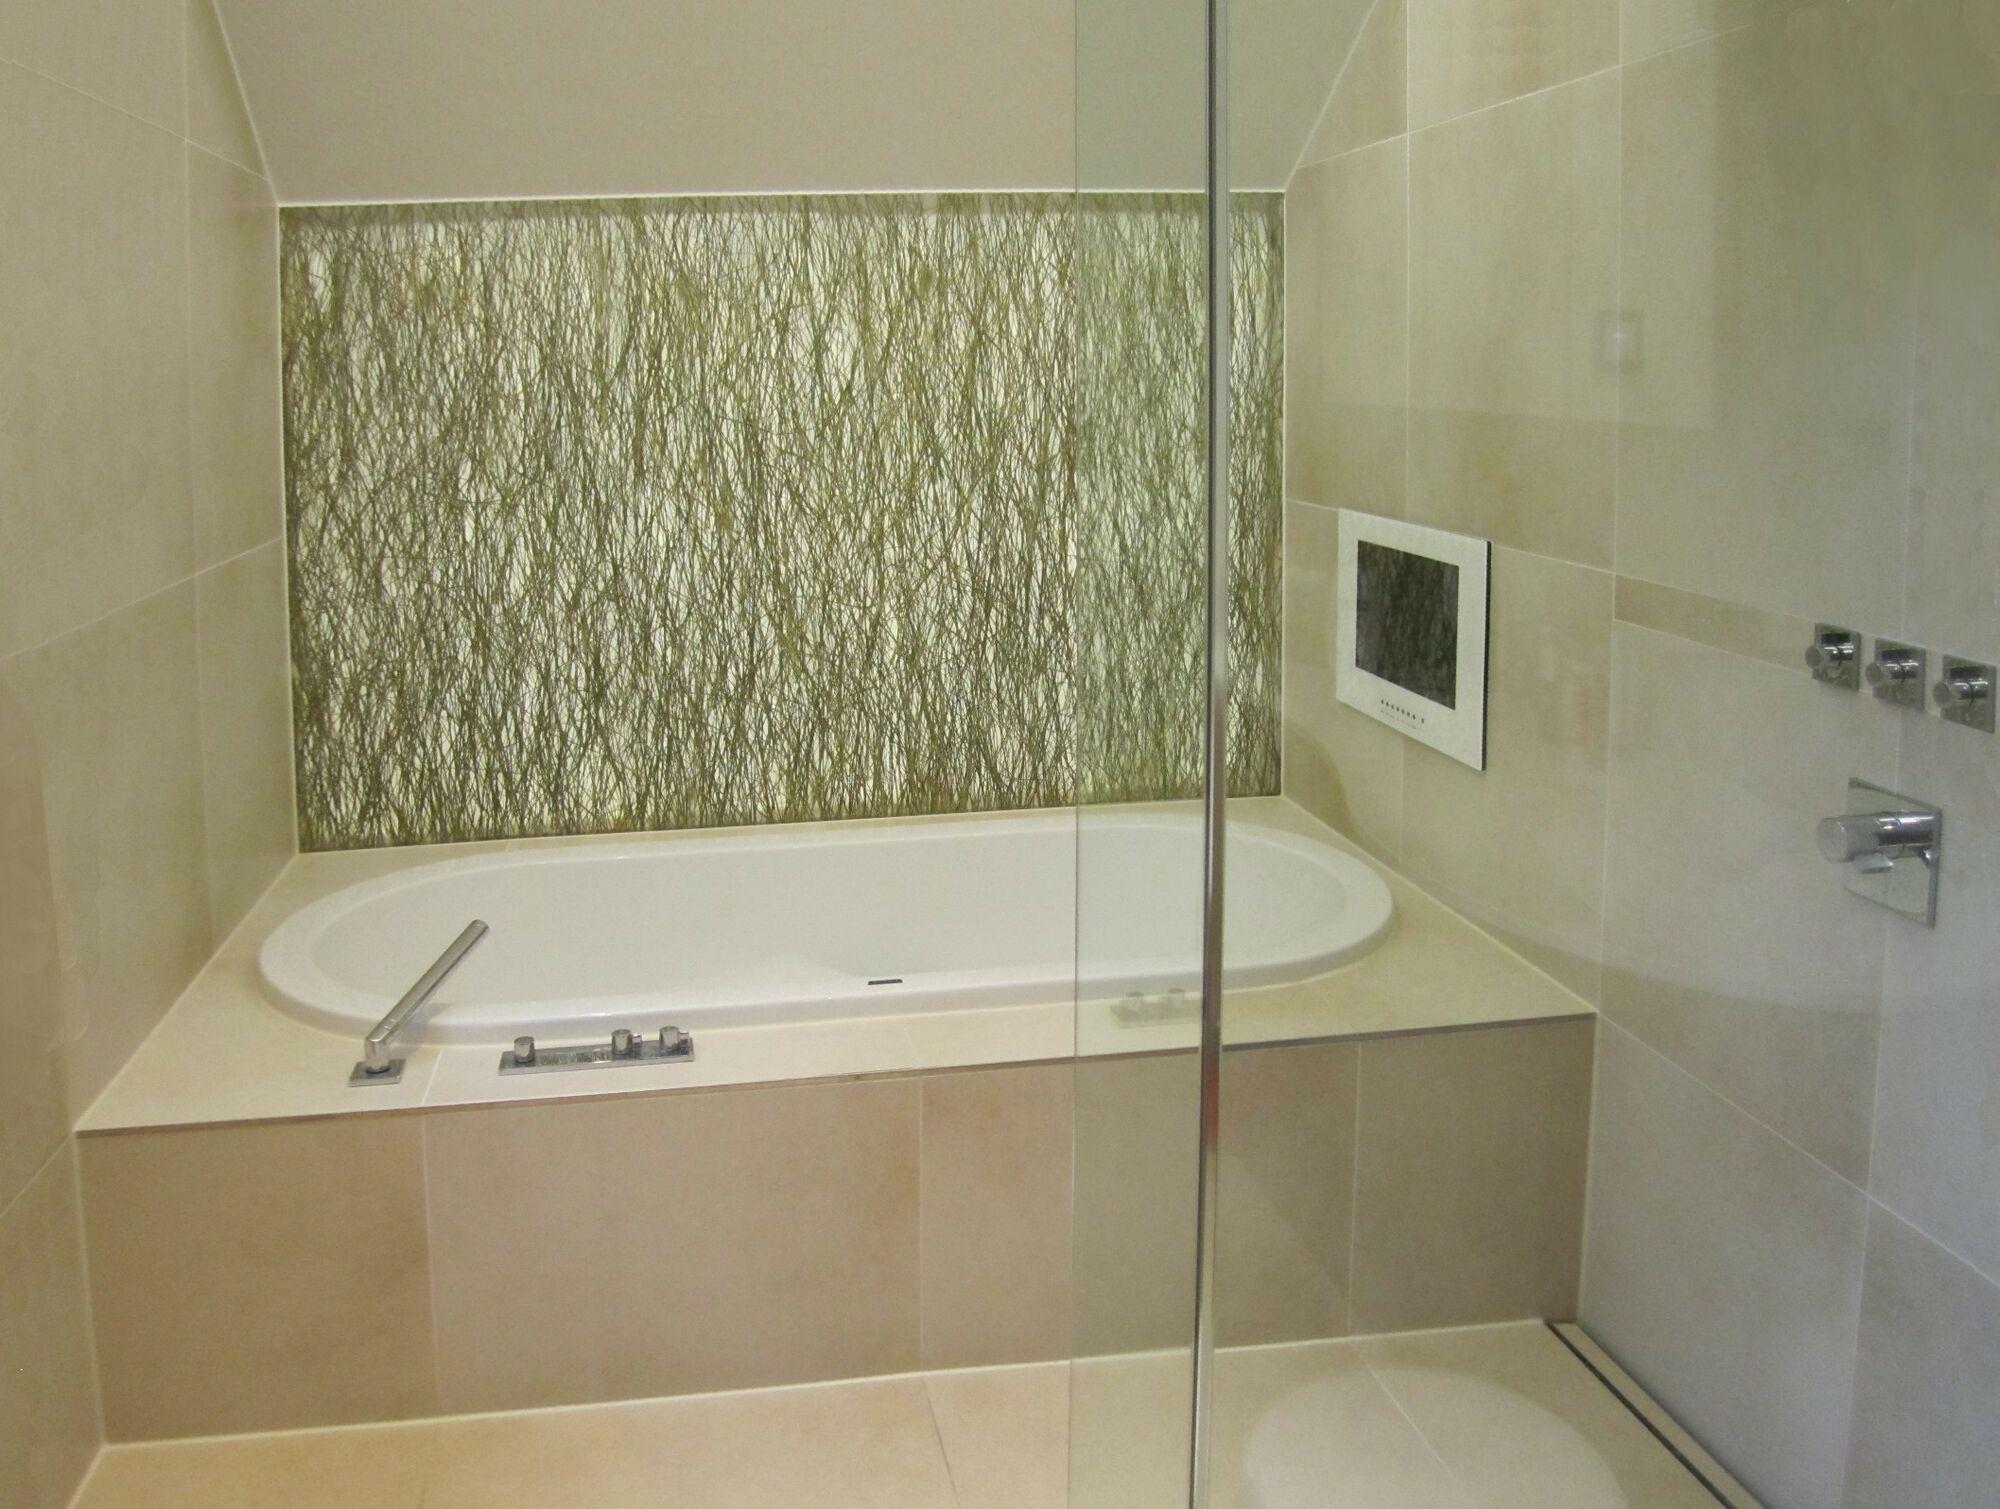 Einbau lcd 17 zoll splashvision bigsplash ab17 wasserdichtes einbau lcd 17 zoll - Vde 0100 badezimmer ...